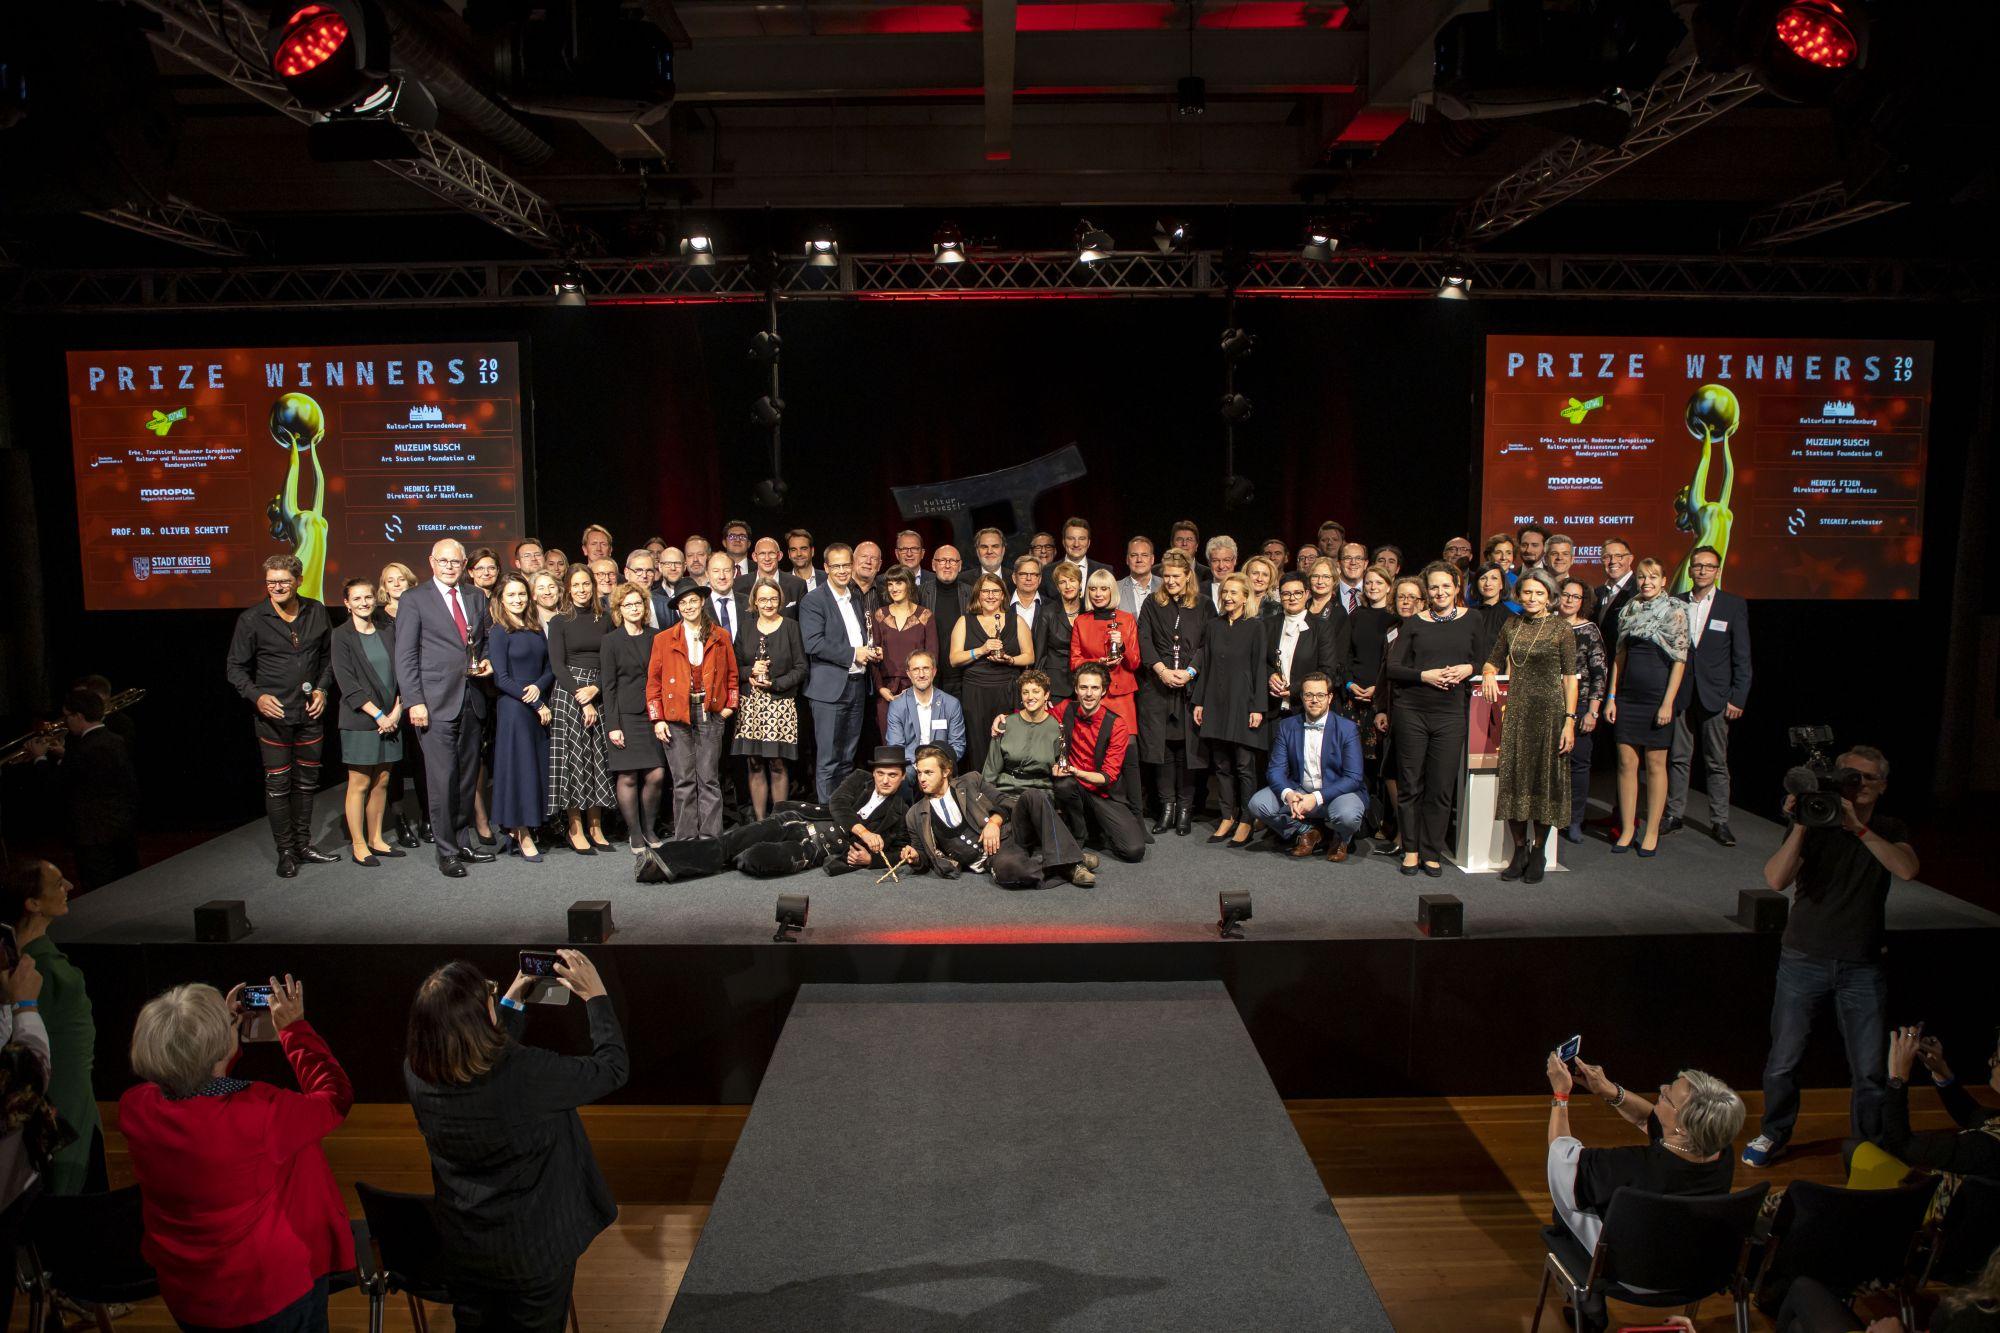 Preisträger und Laudatoren 2019, Copyright: Hans-Conrad Walter